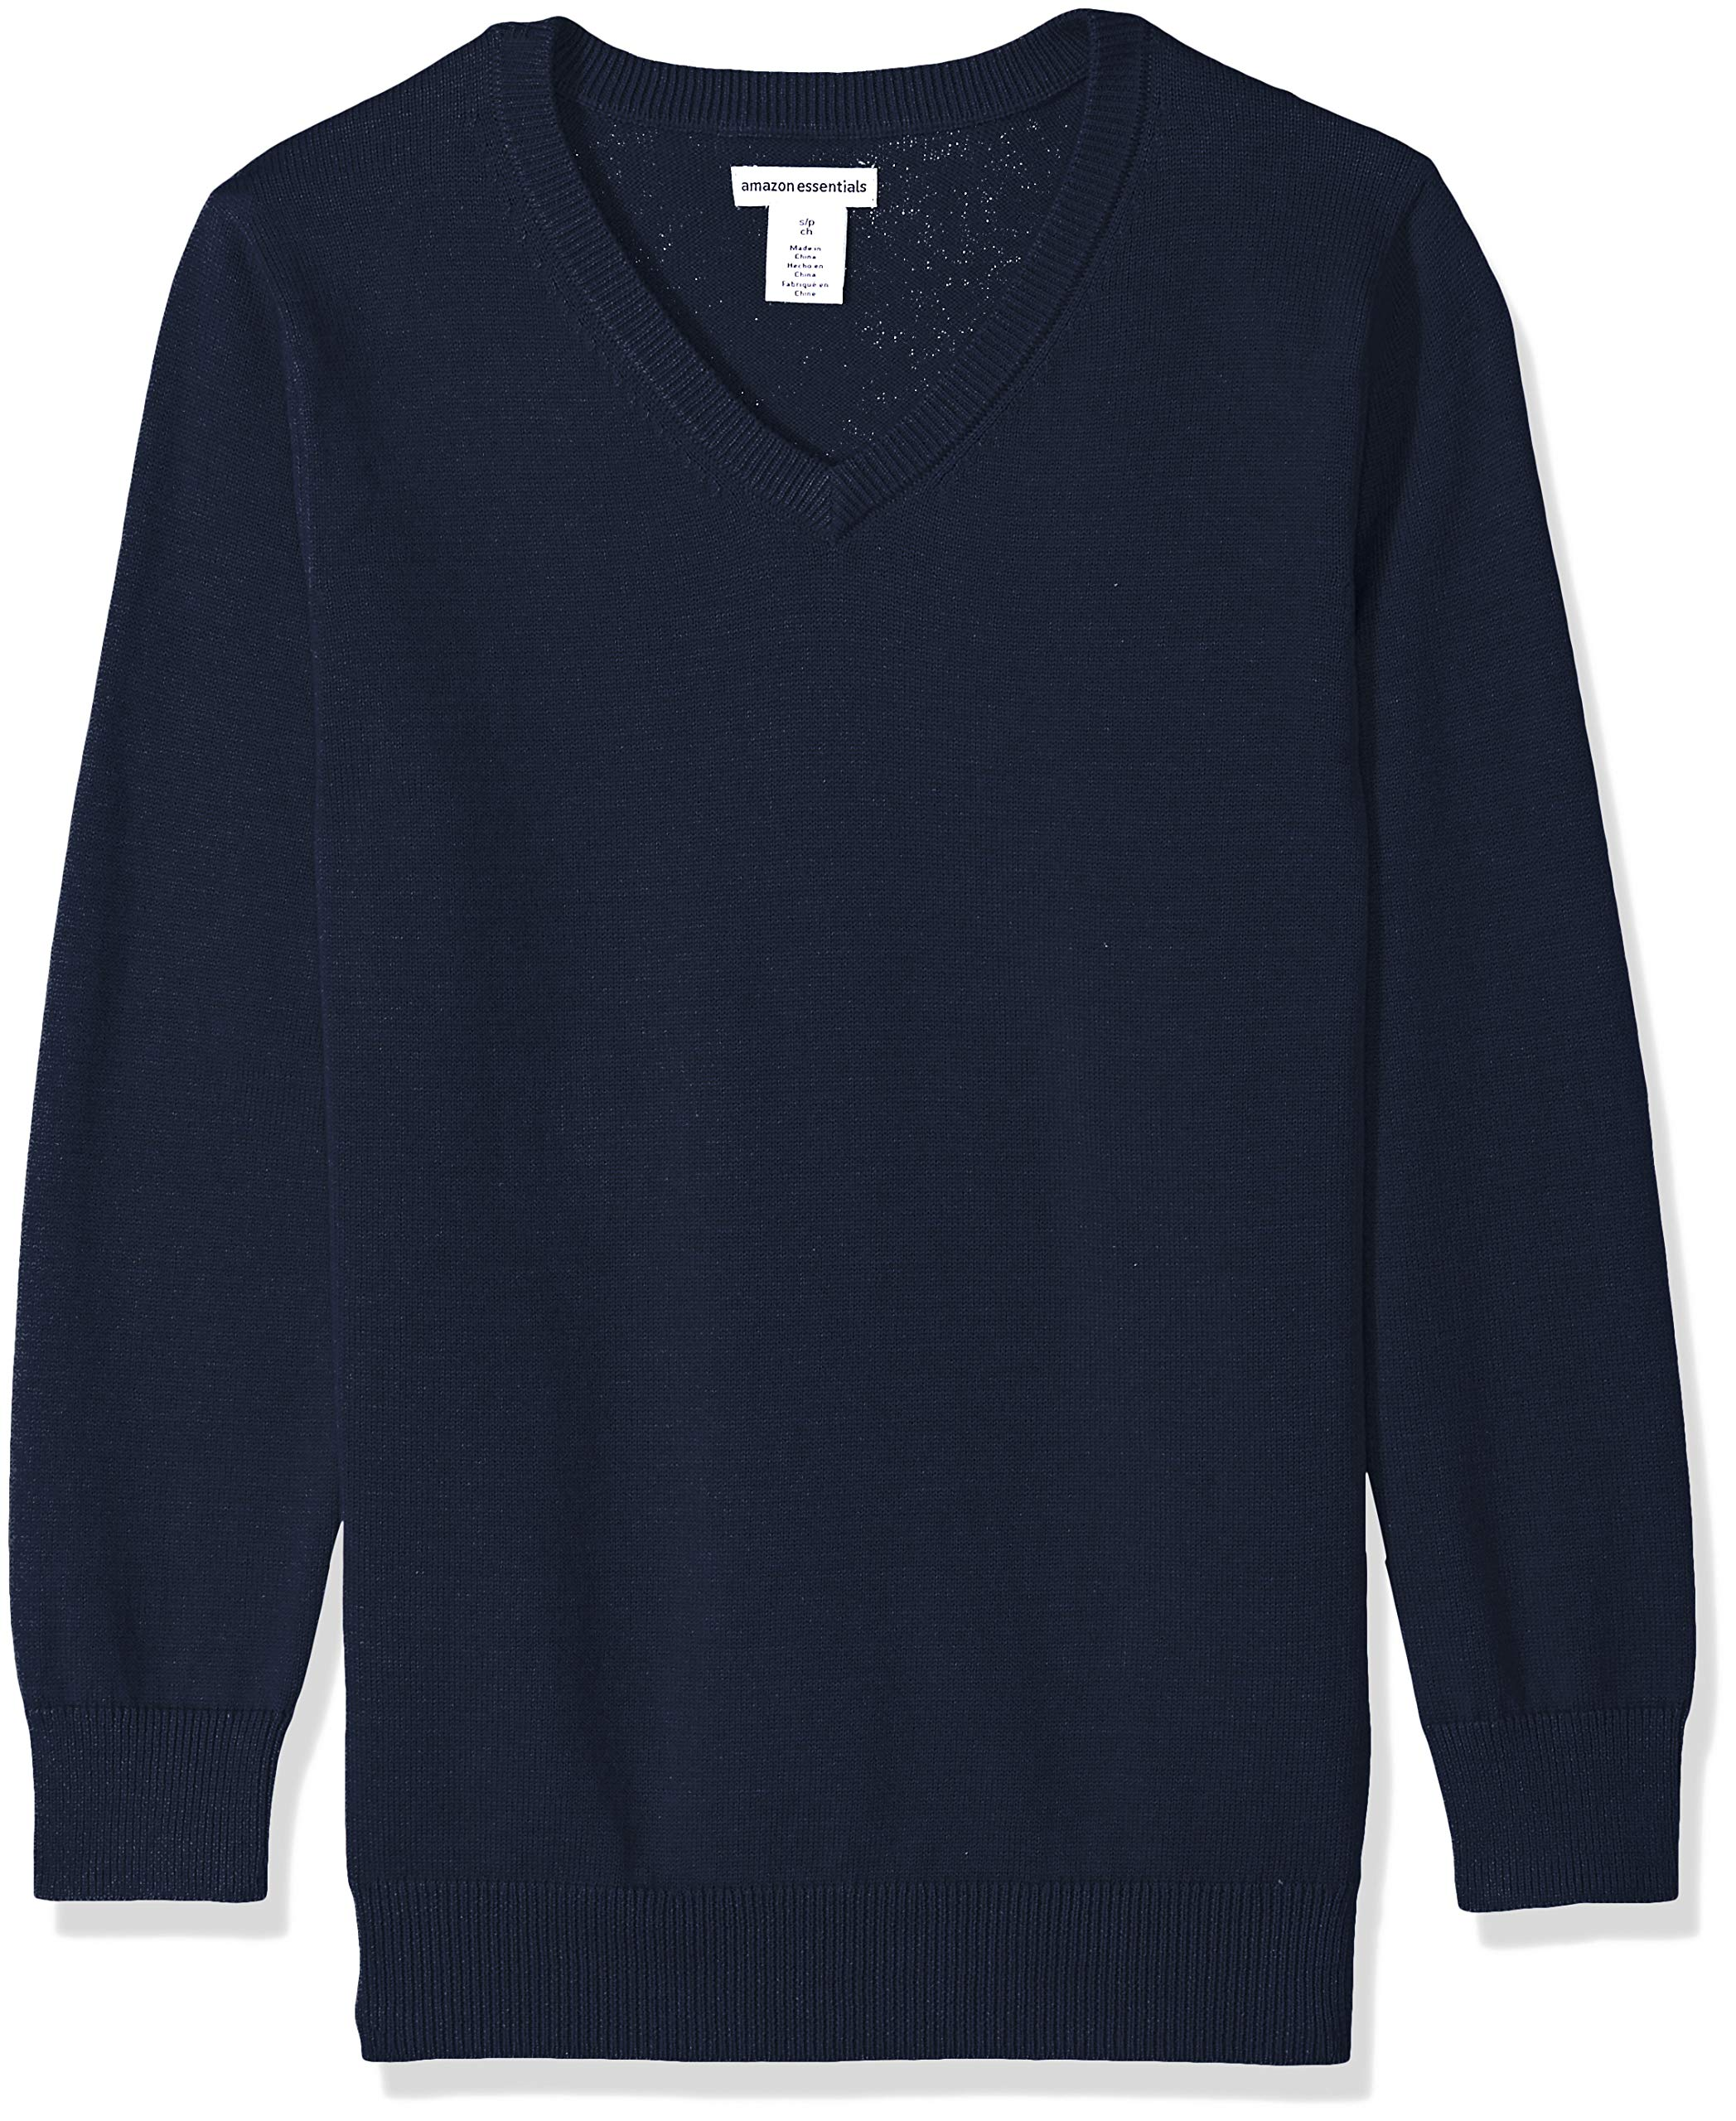 Amazon Essentials Big Boys' Uniform V-Neck Sweater, Navy Blazer, XL